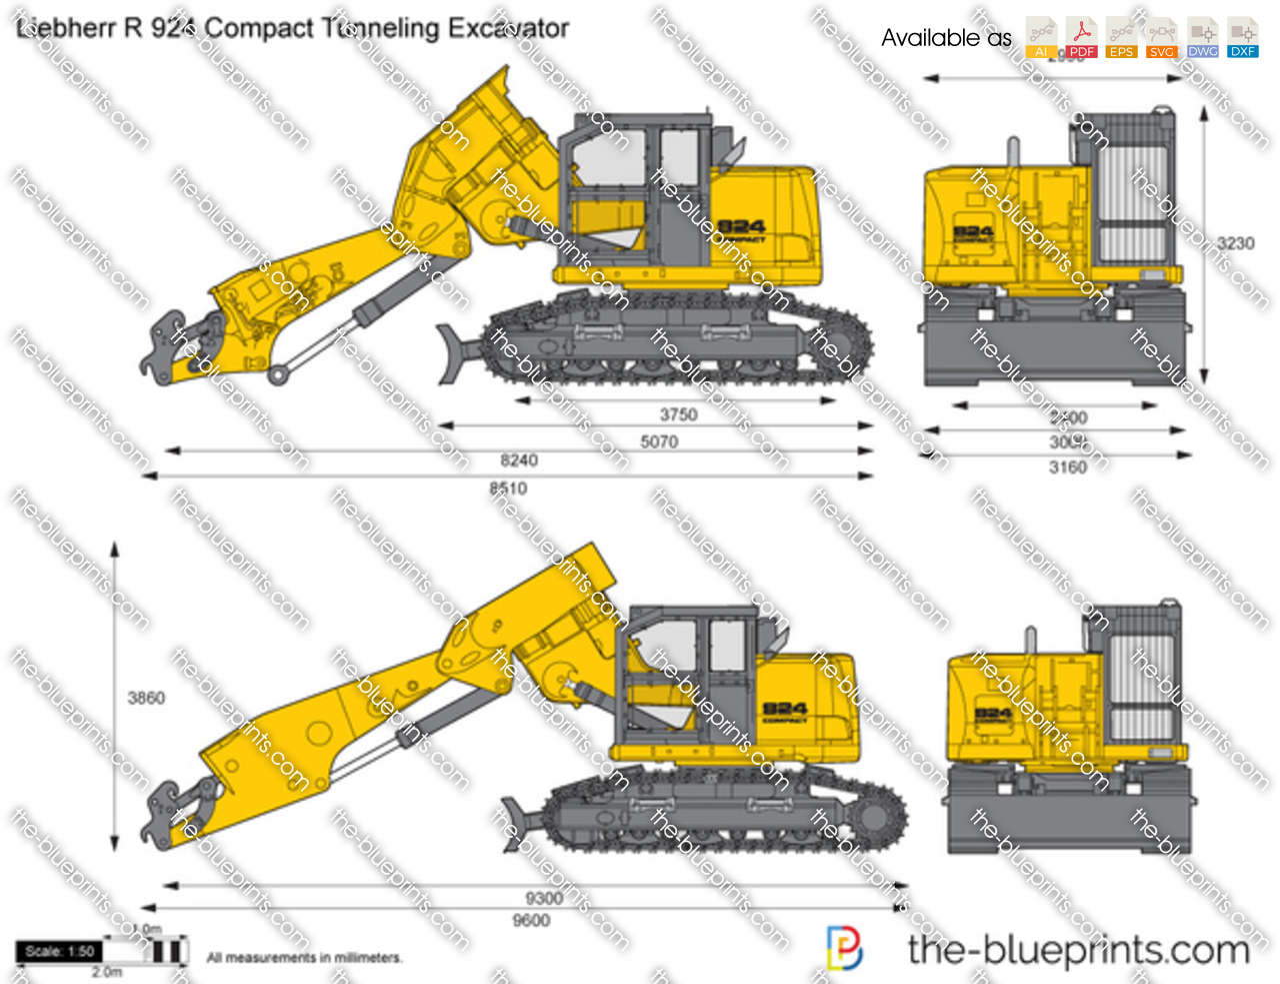 Liebherr R 924 Compact Tunneling Excavator